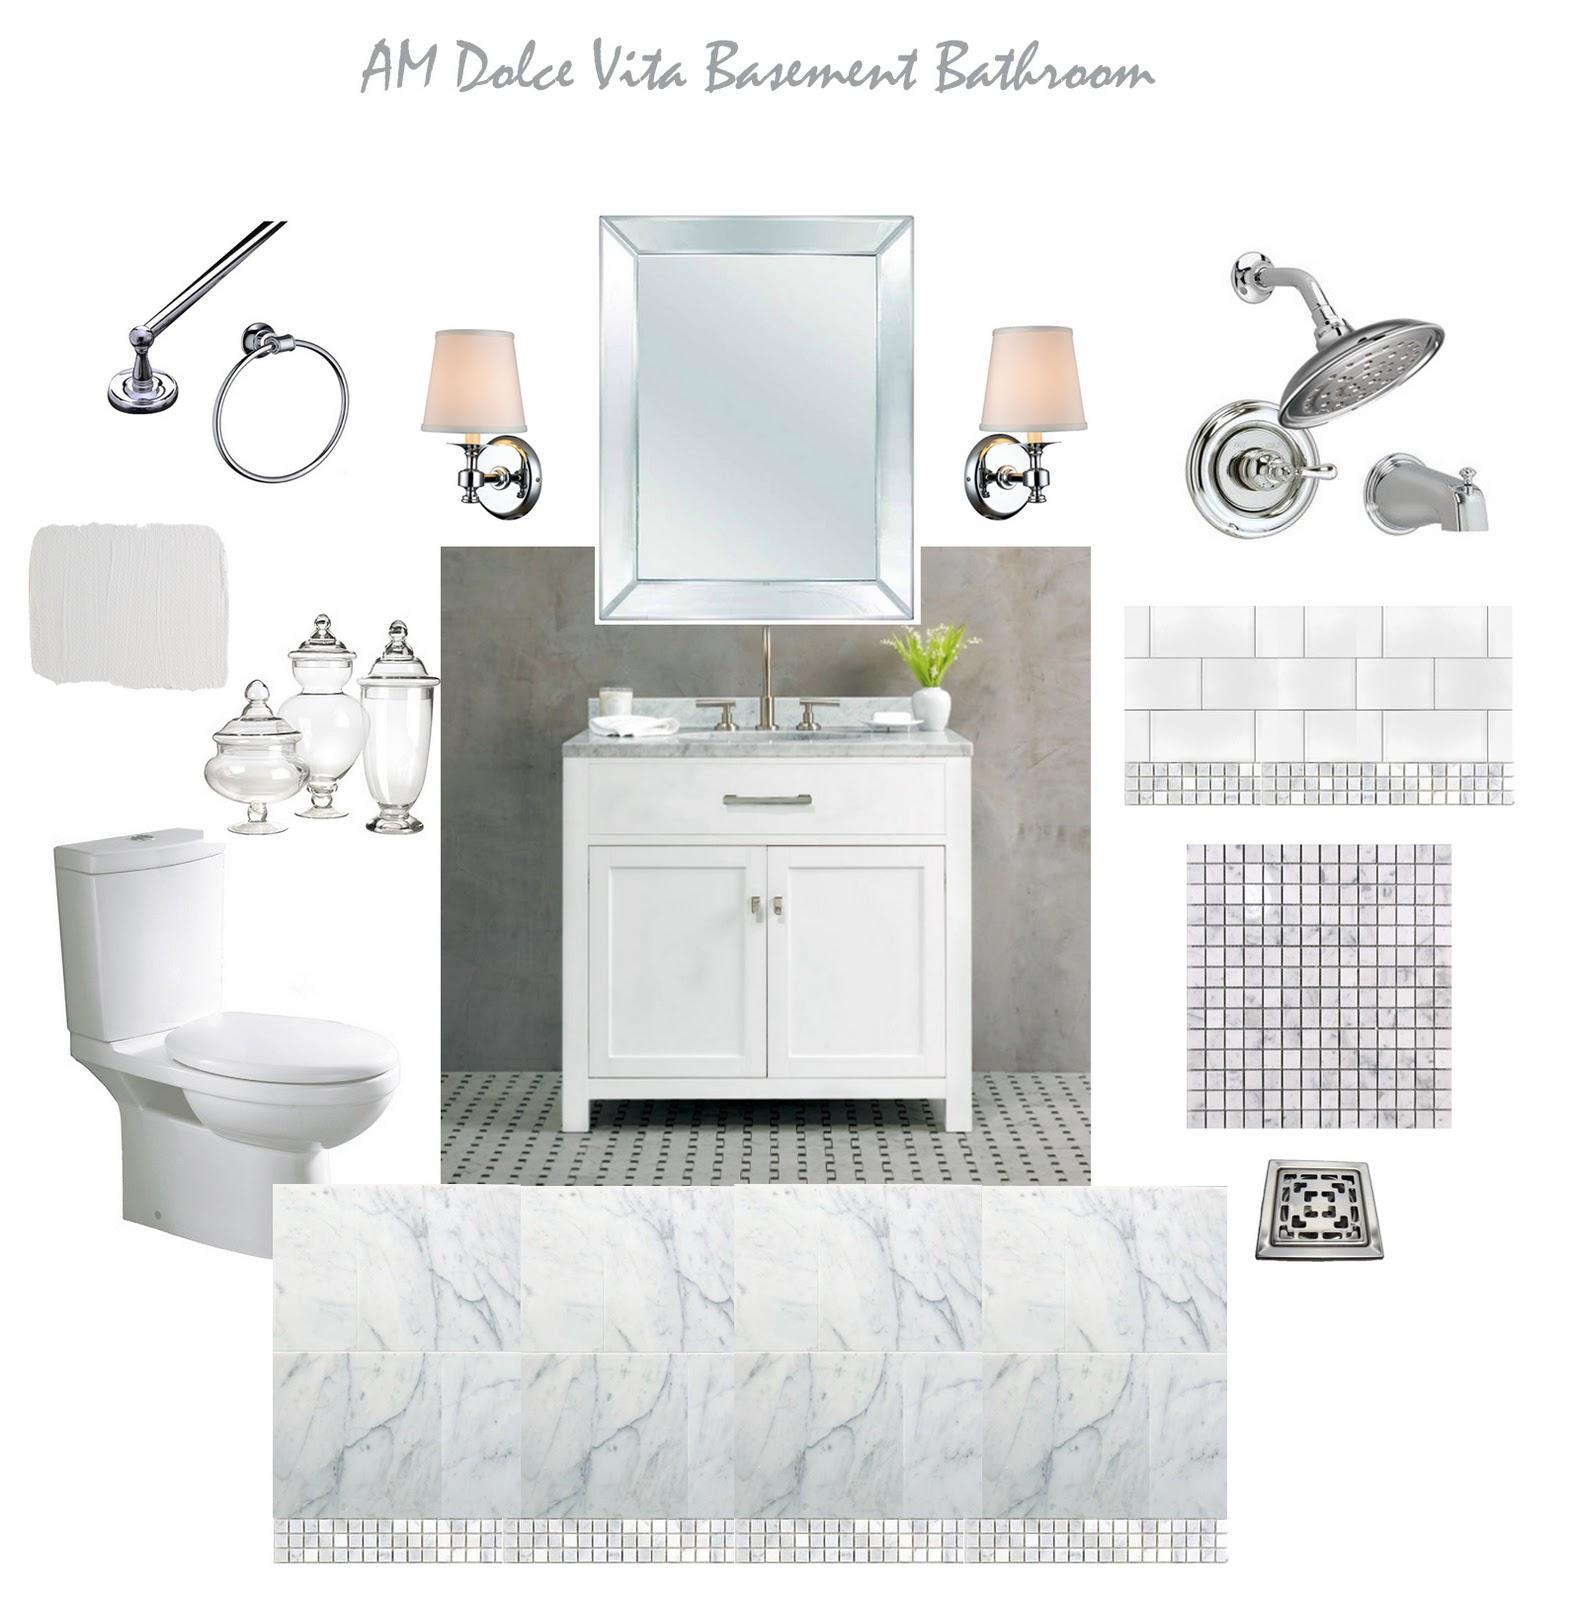 Am dolce vita october 2011 for Bathroom design board